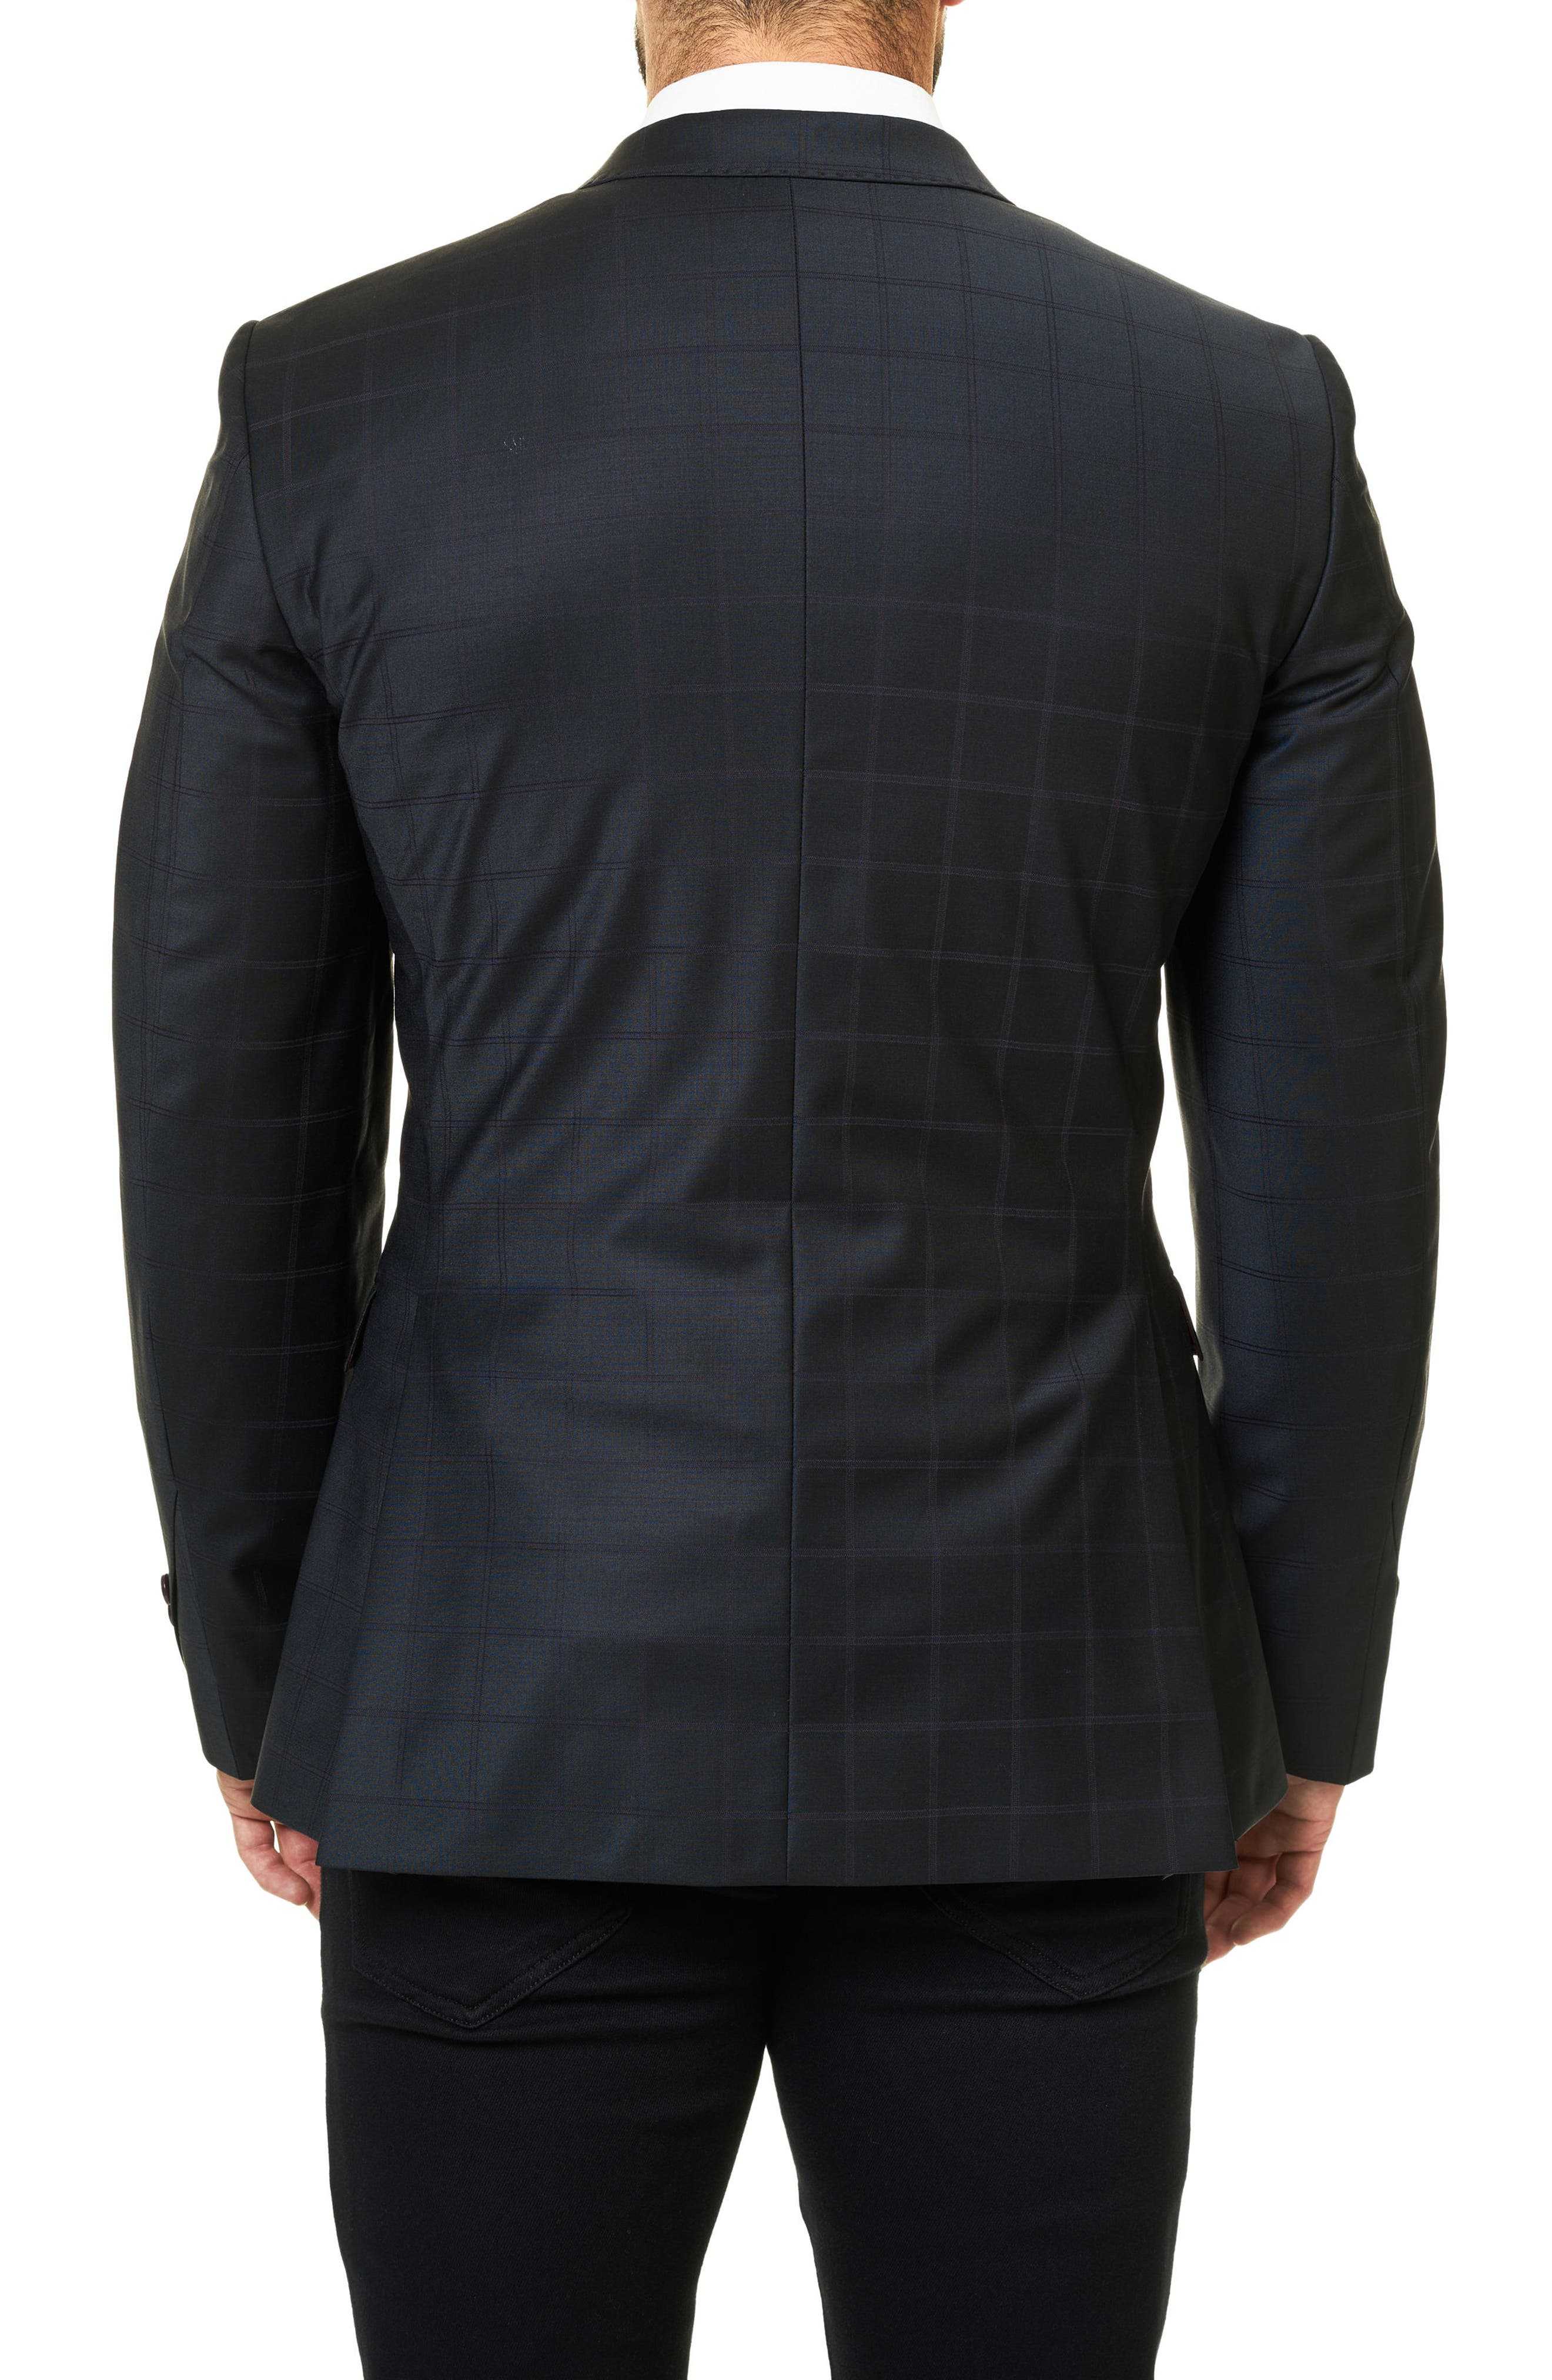 Descarte Windowpane Sport Coat,                             Alternate thumbnail 2, color,                             Solid Black